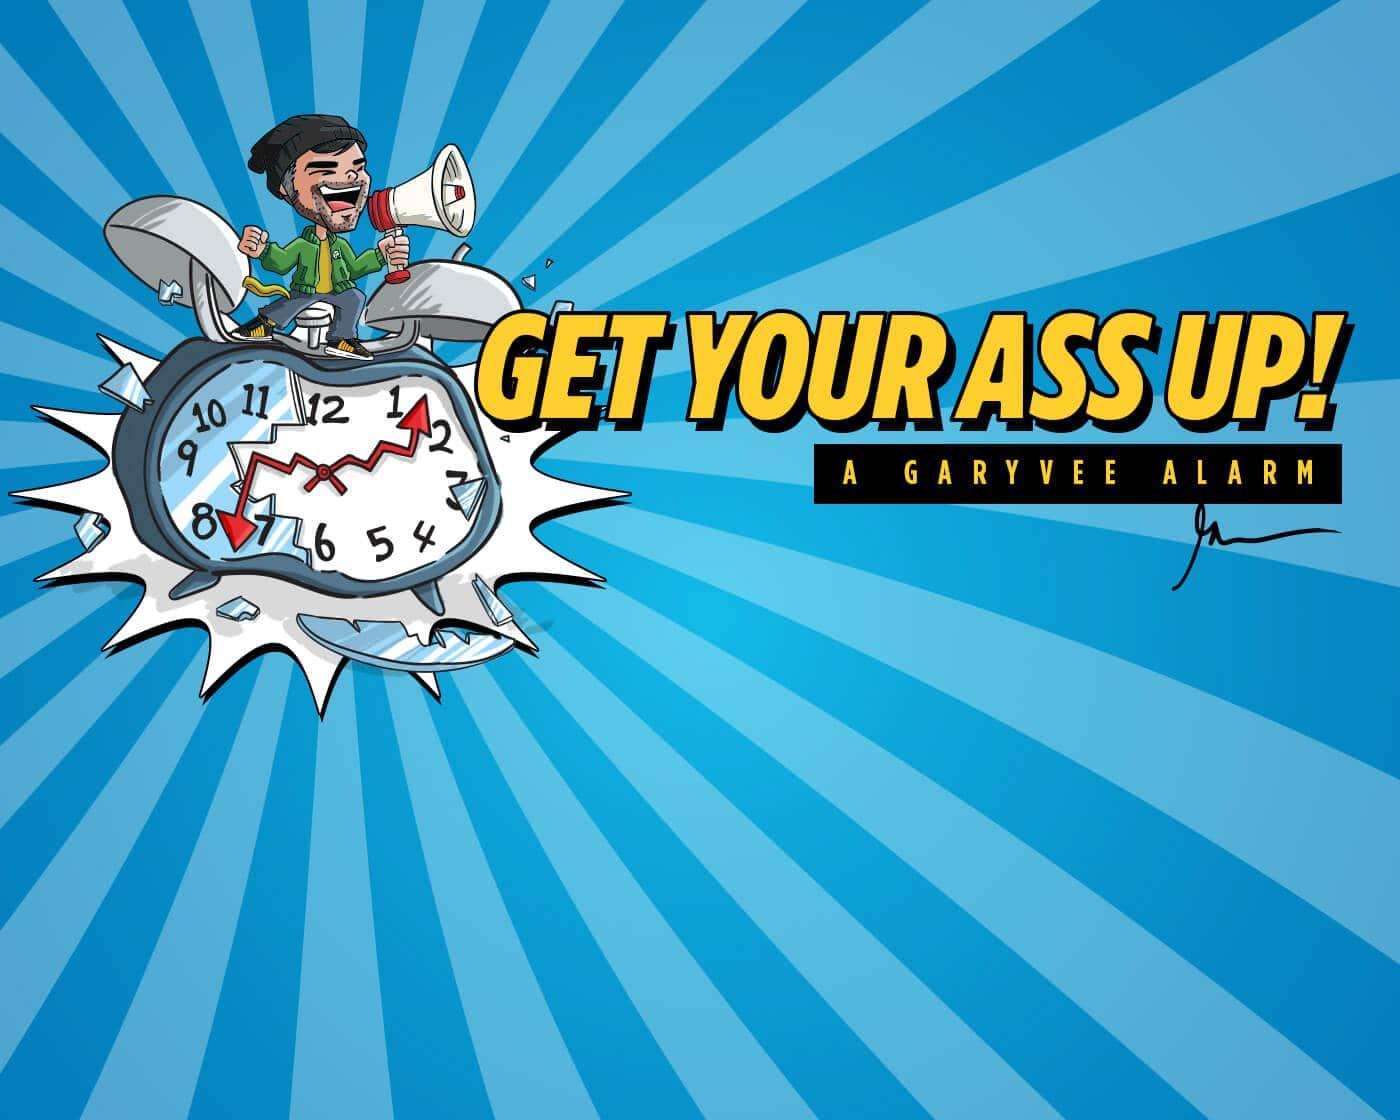 motivational ringtone for morning alarm